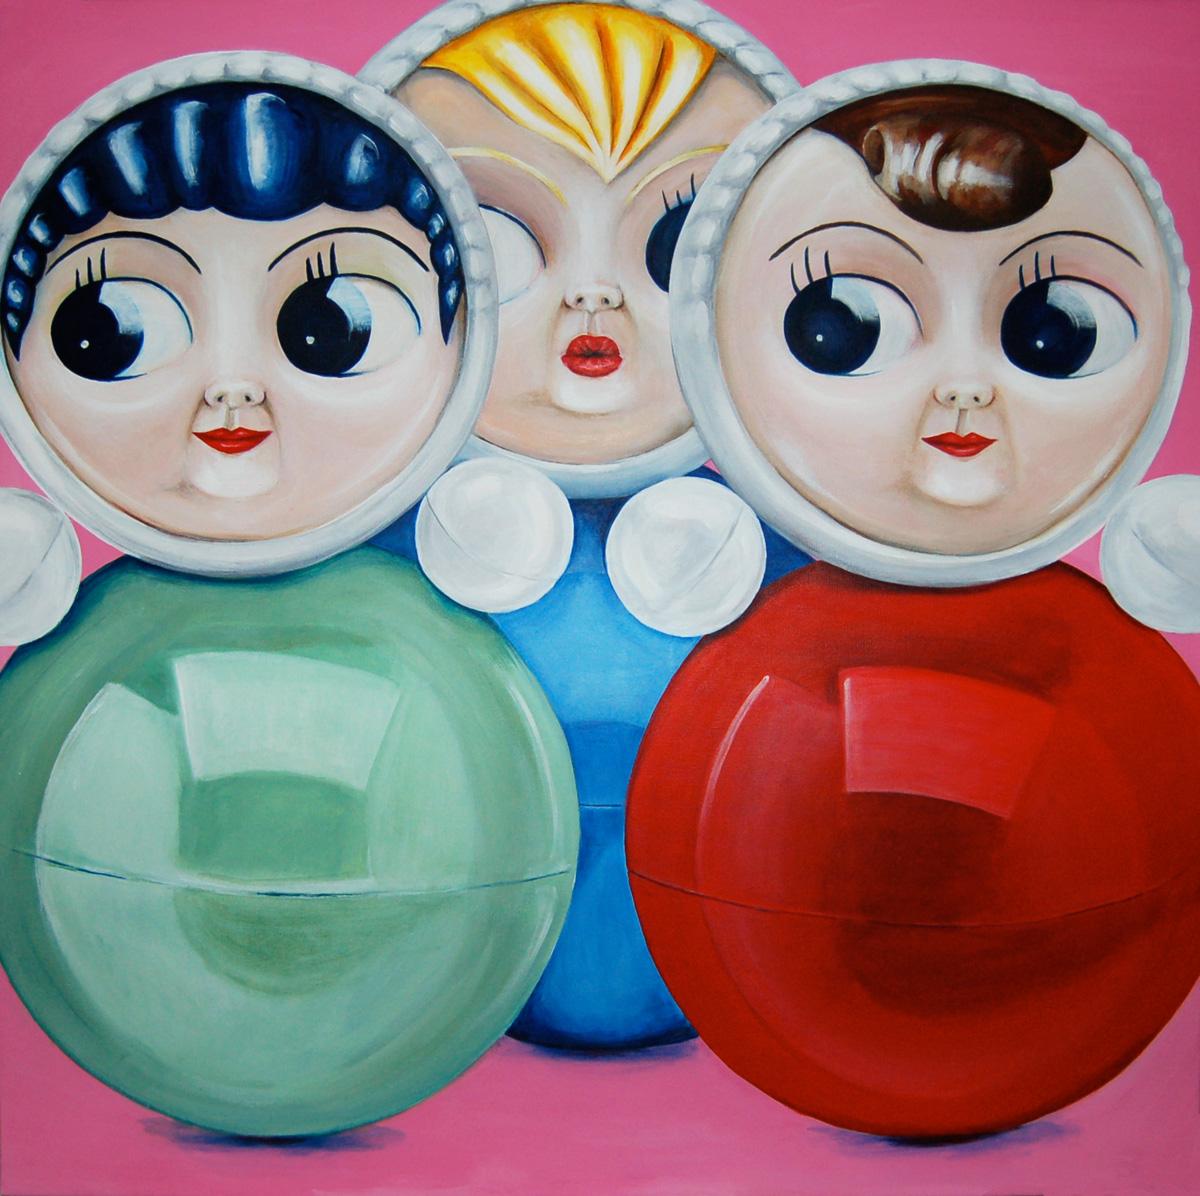 paintings, paintings, dolls, turquoise, blue, red, online galleries, art, pop art, surrealist paintings, figurative talented artists